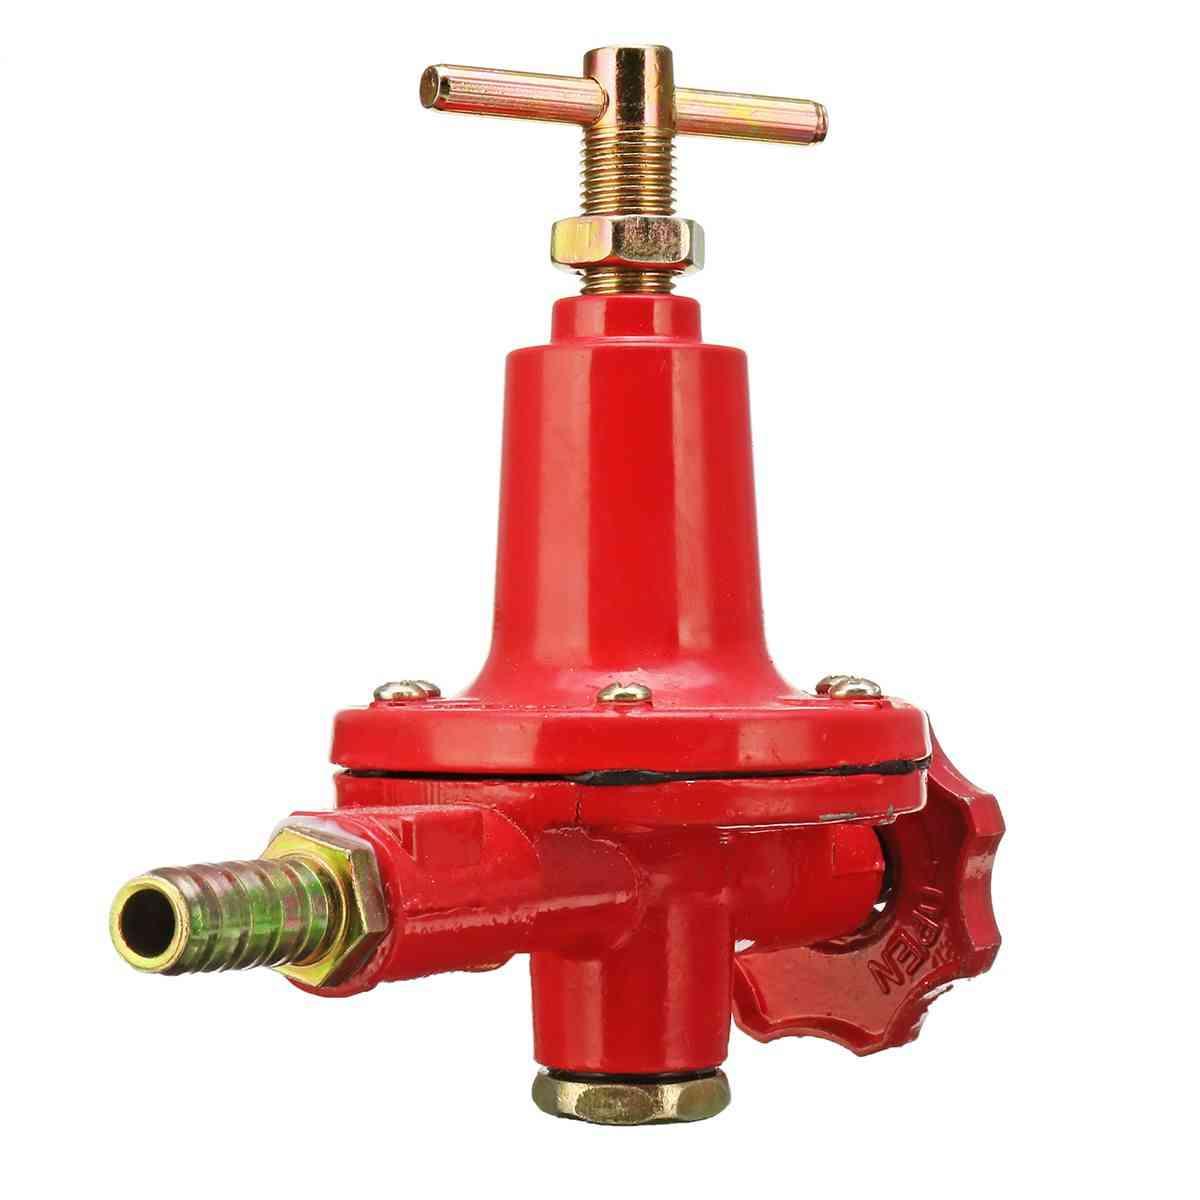 High Pressure- Propane Regulator, Flow Outdoor, Gas Heater